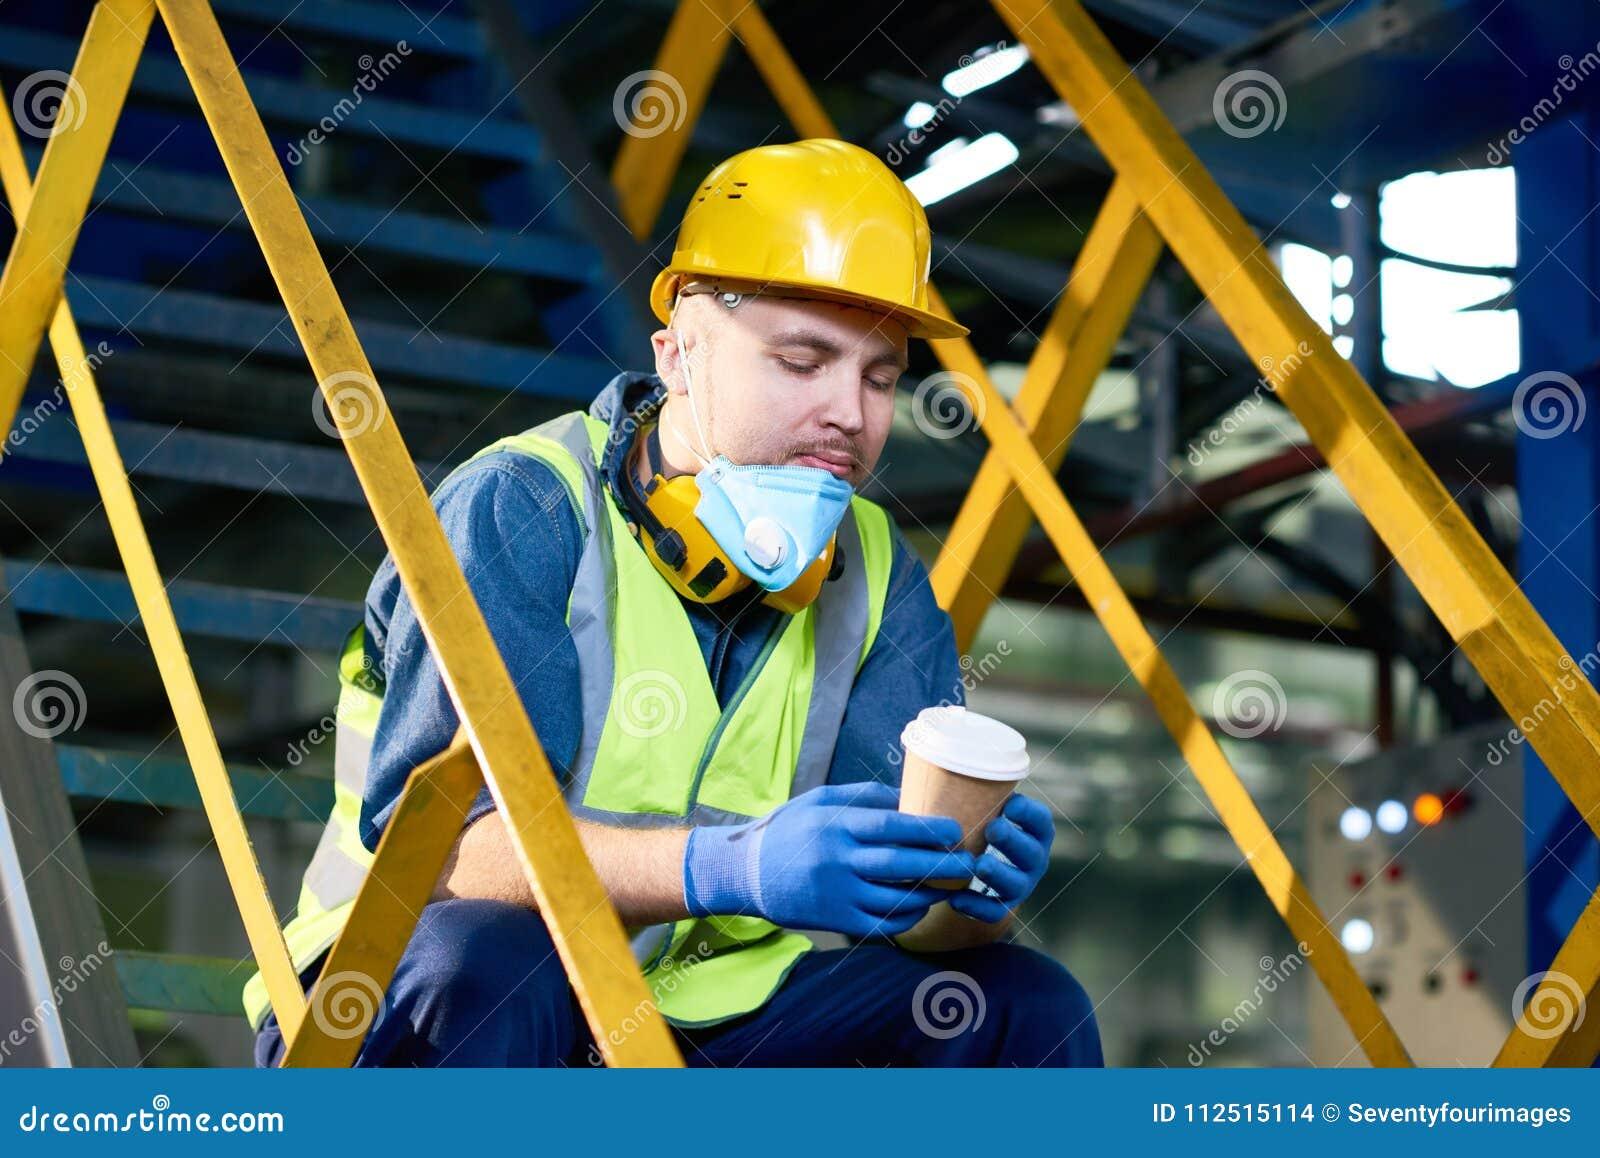 Take Break Coffeebreak : Young man taking coffee break at plant stock photo image of